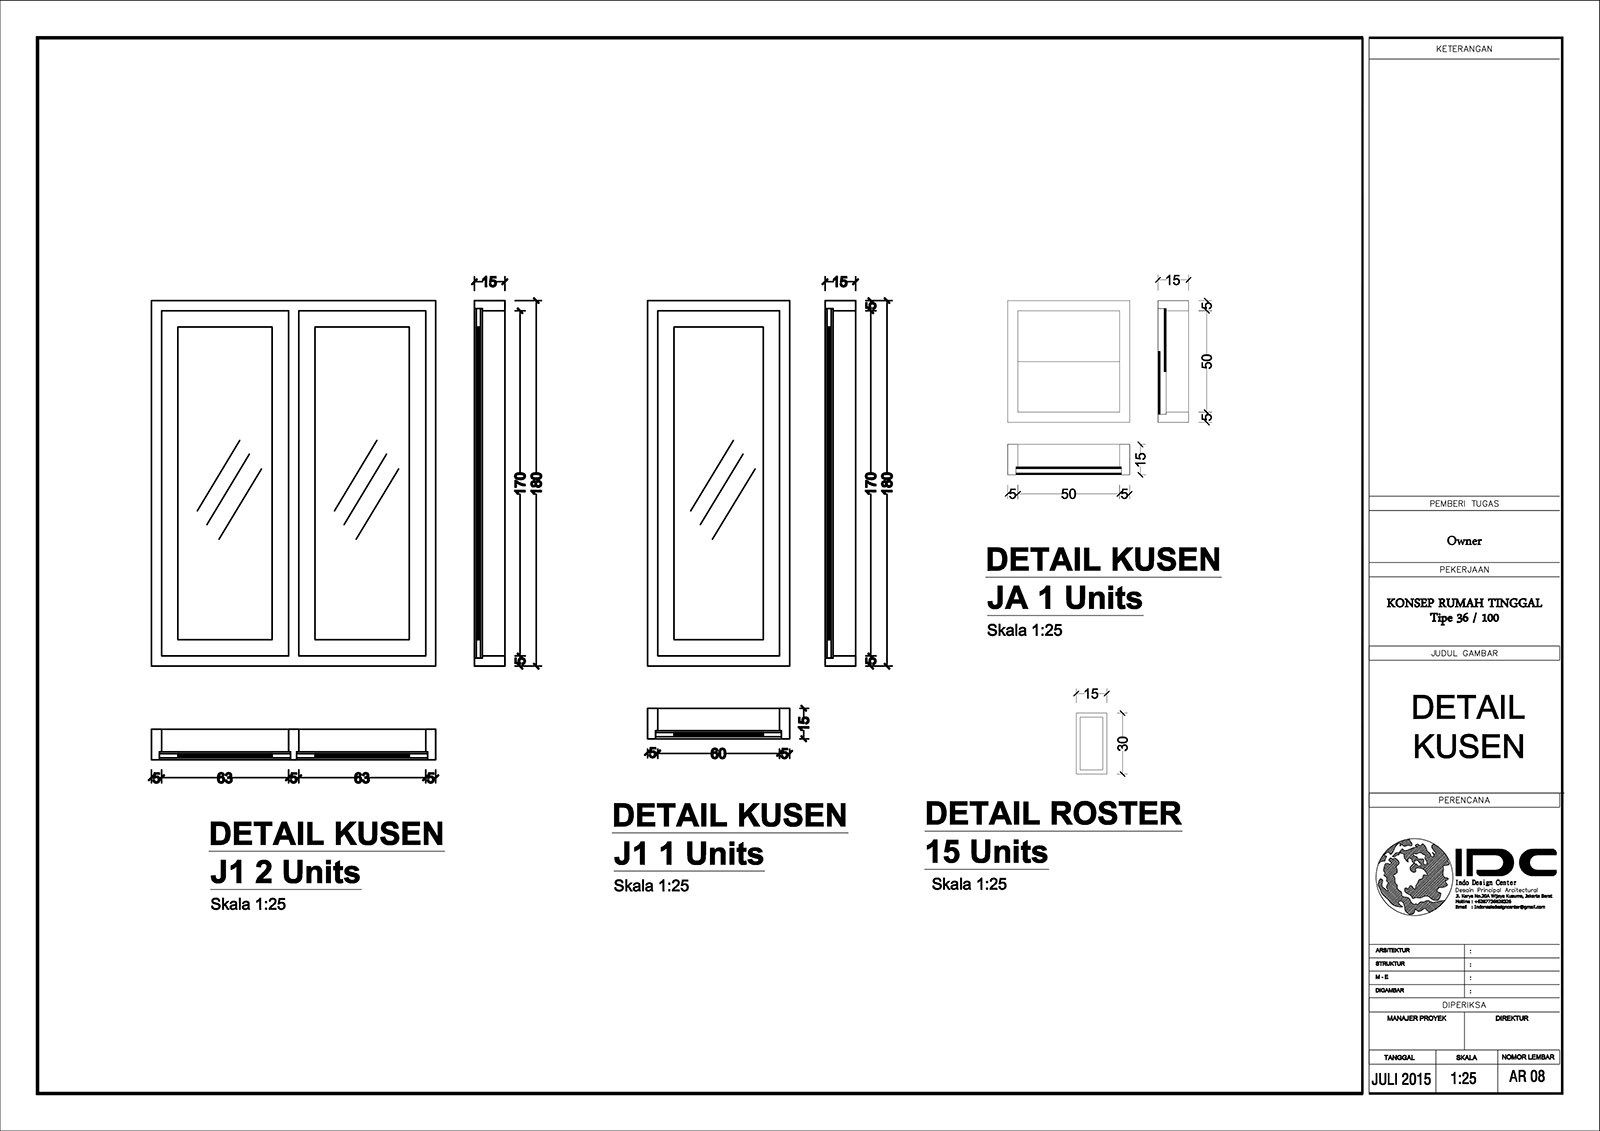 Ukuran Kusen Jendela Rumah Minimalis Cek Bahan Bangunan Ukuran jendela kamar tidur minimalis